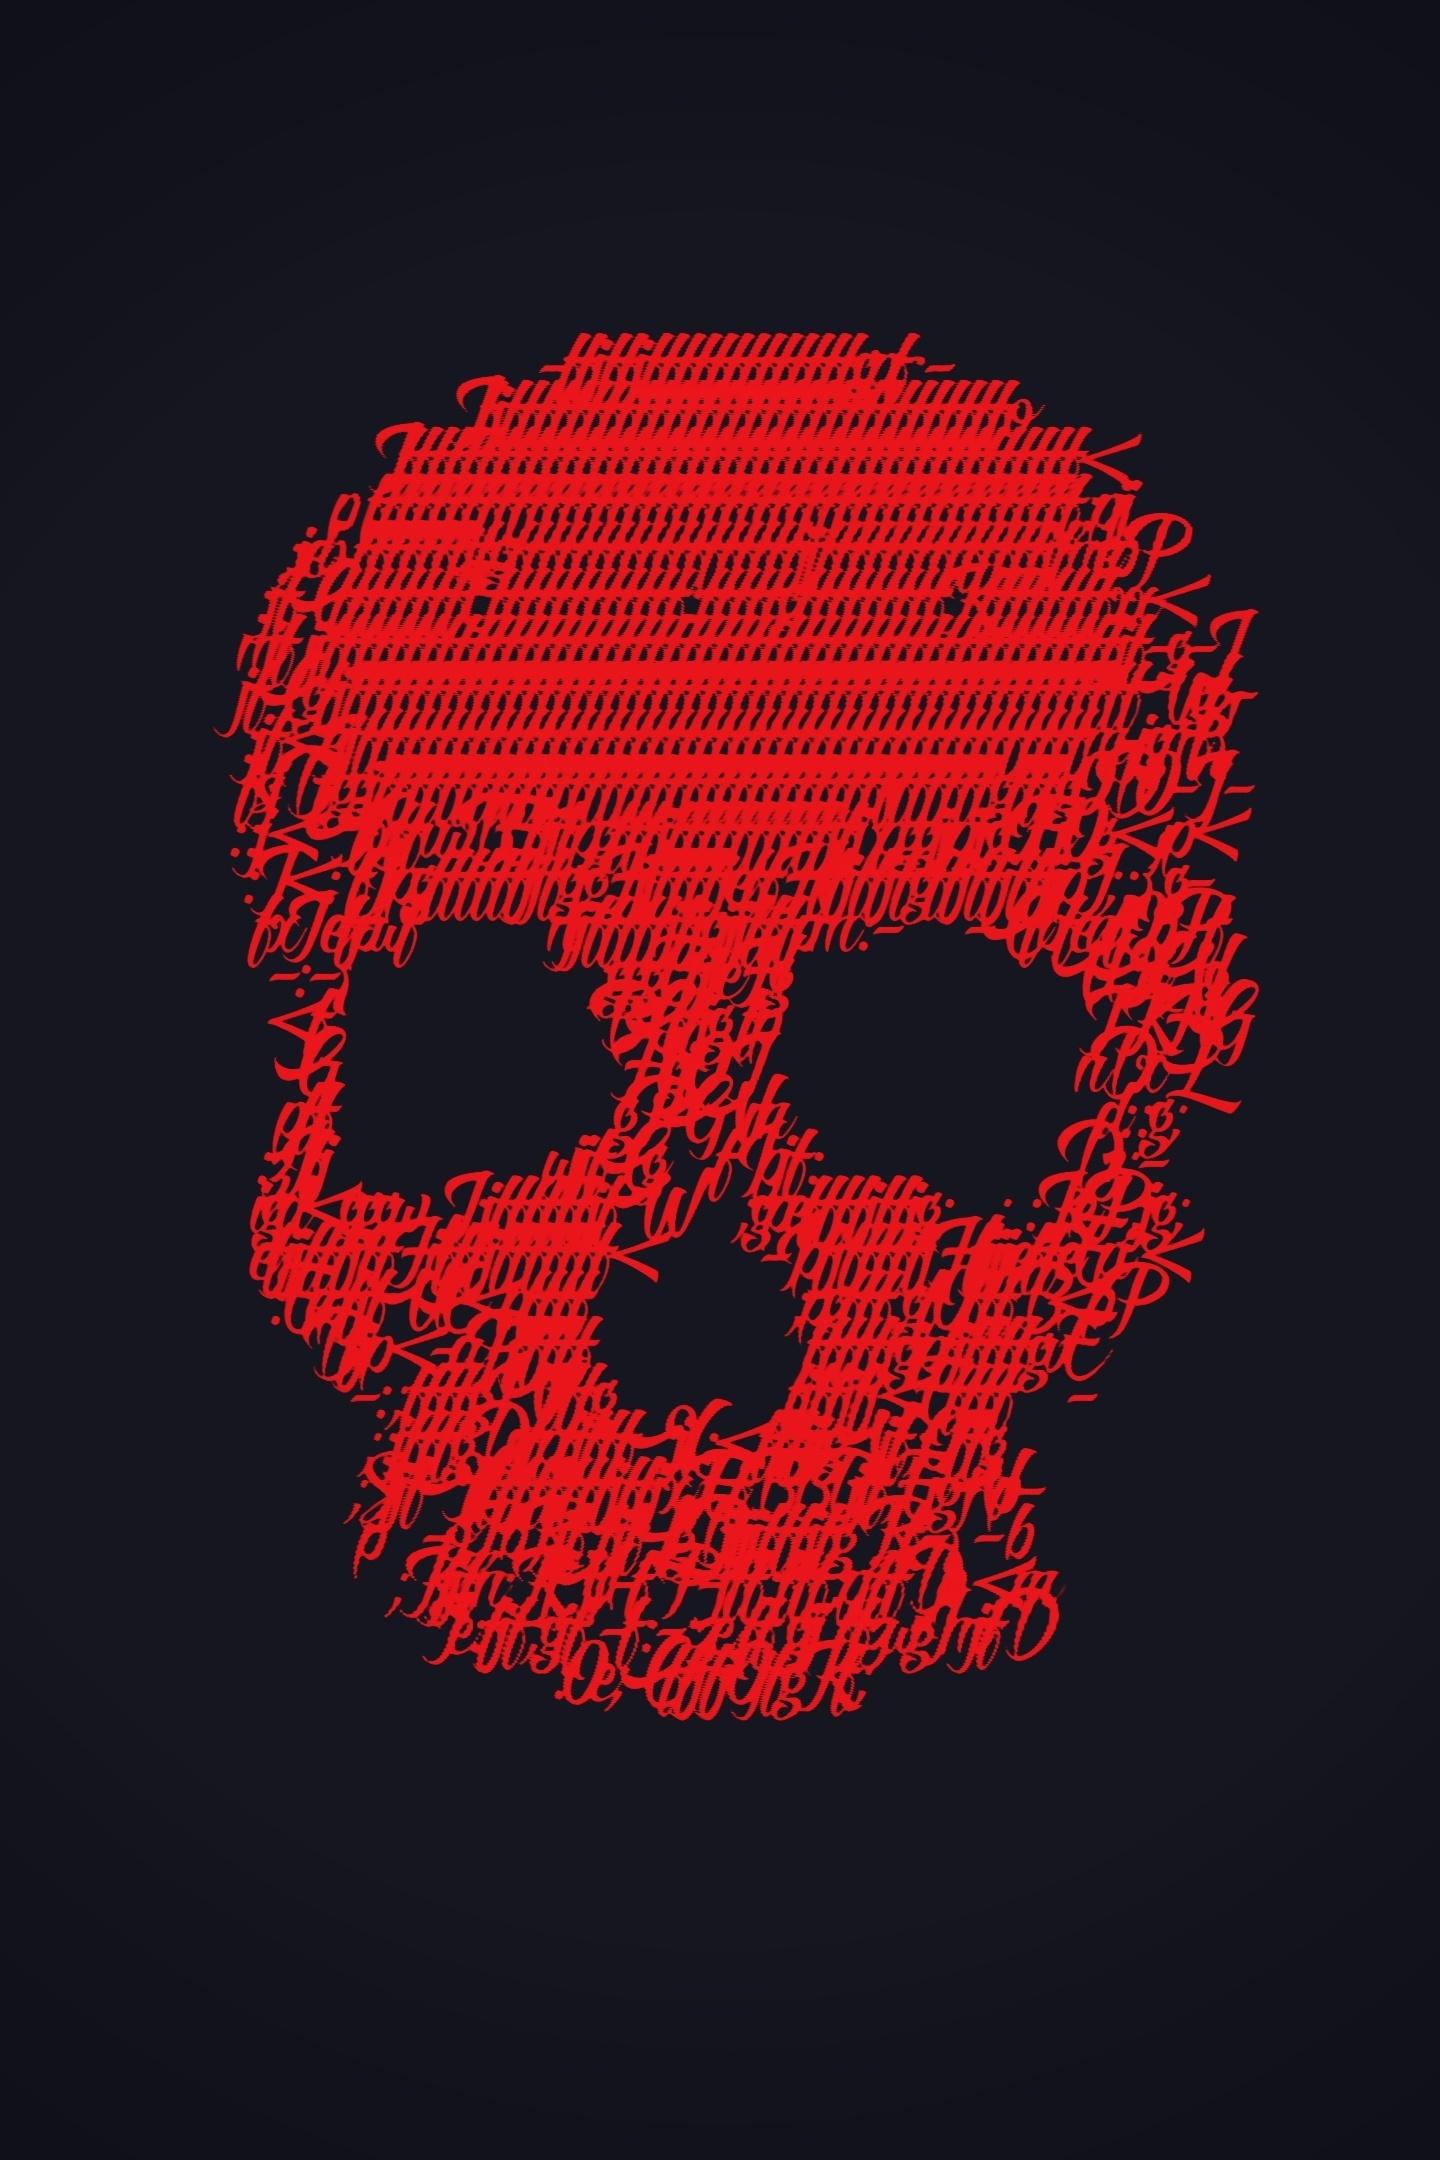 Download 1440x2960 Wallpaper Skull Glitch Art Minimal Dark Red Samsung Galaxy S8 Samsung Galaxy S8 Plus 1440x2960 Hd Image Background 6682